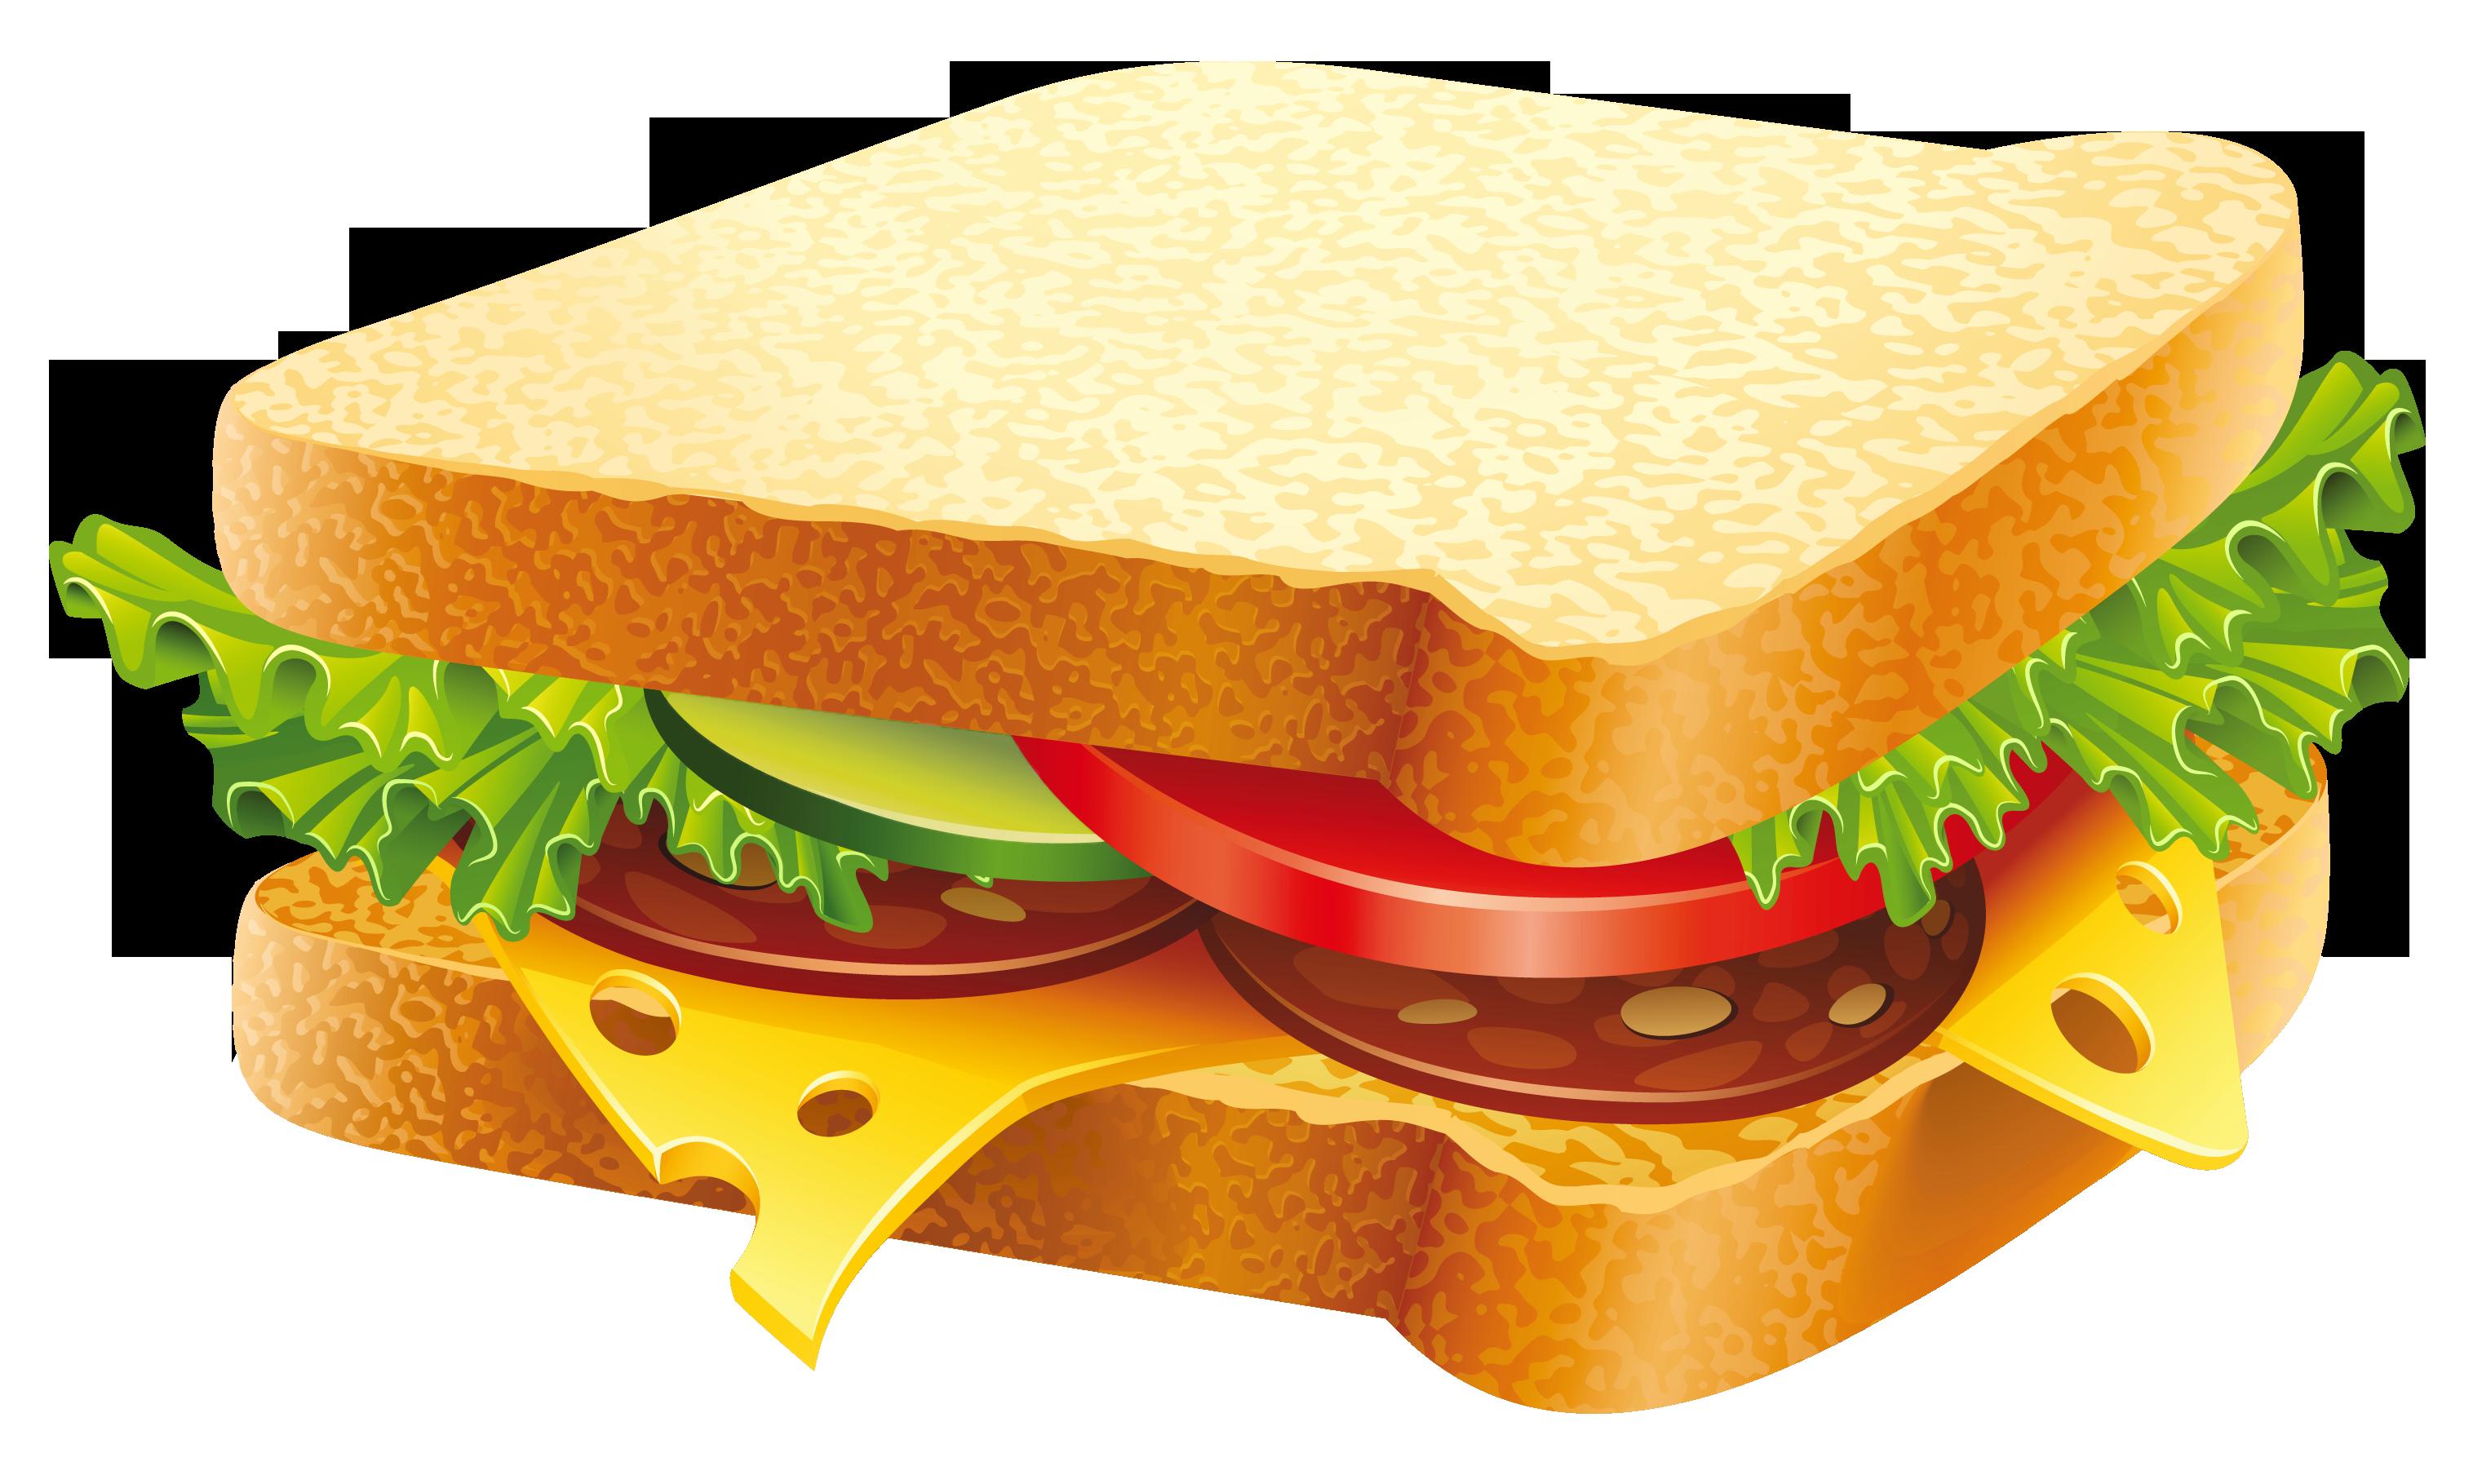 Turkey and cheese sandwhich clipart clip freeuse stock Hamburger Submarine sandwich Vegetable sandwich - Sandwich PNG ... clip freeuse stock